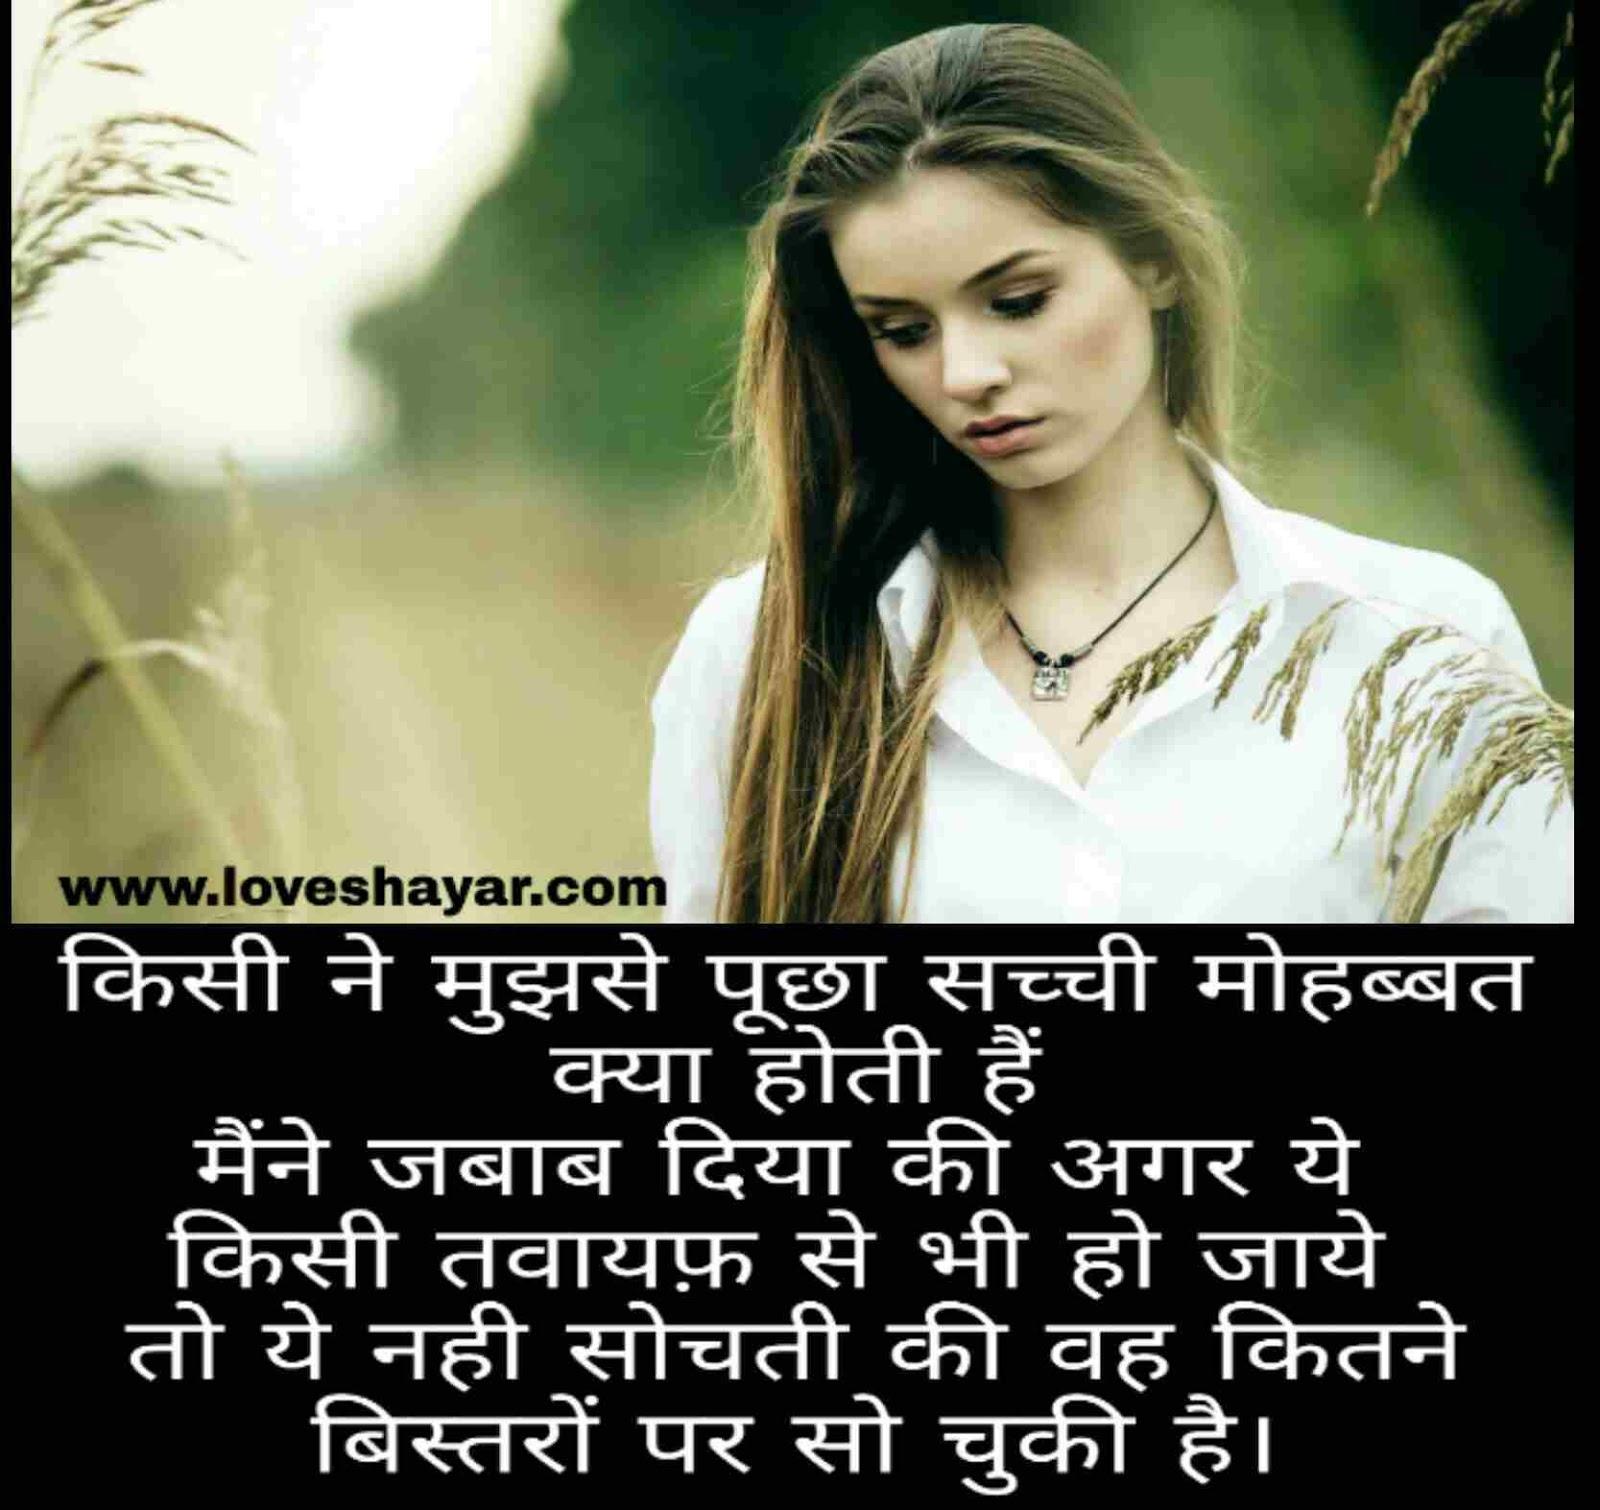 Love Breakup Shayari in Hindi 2020 (ब्रेकअप शायरी)